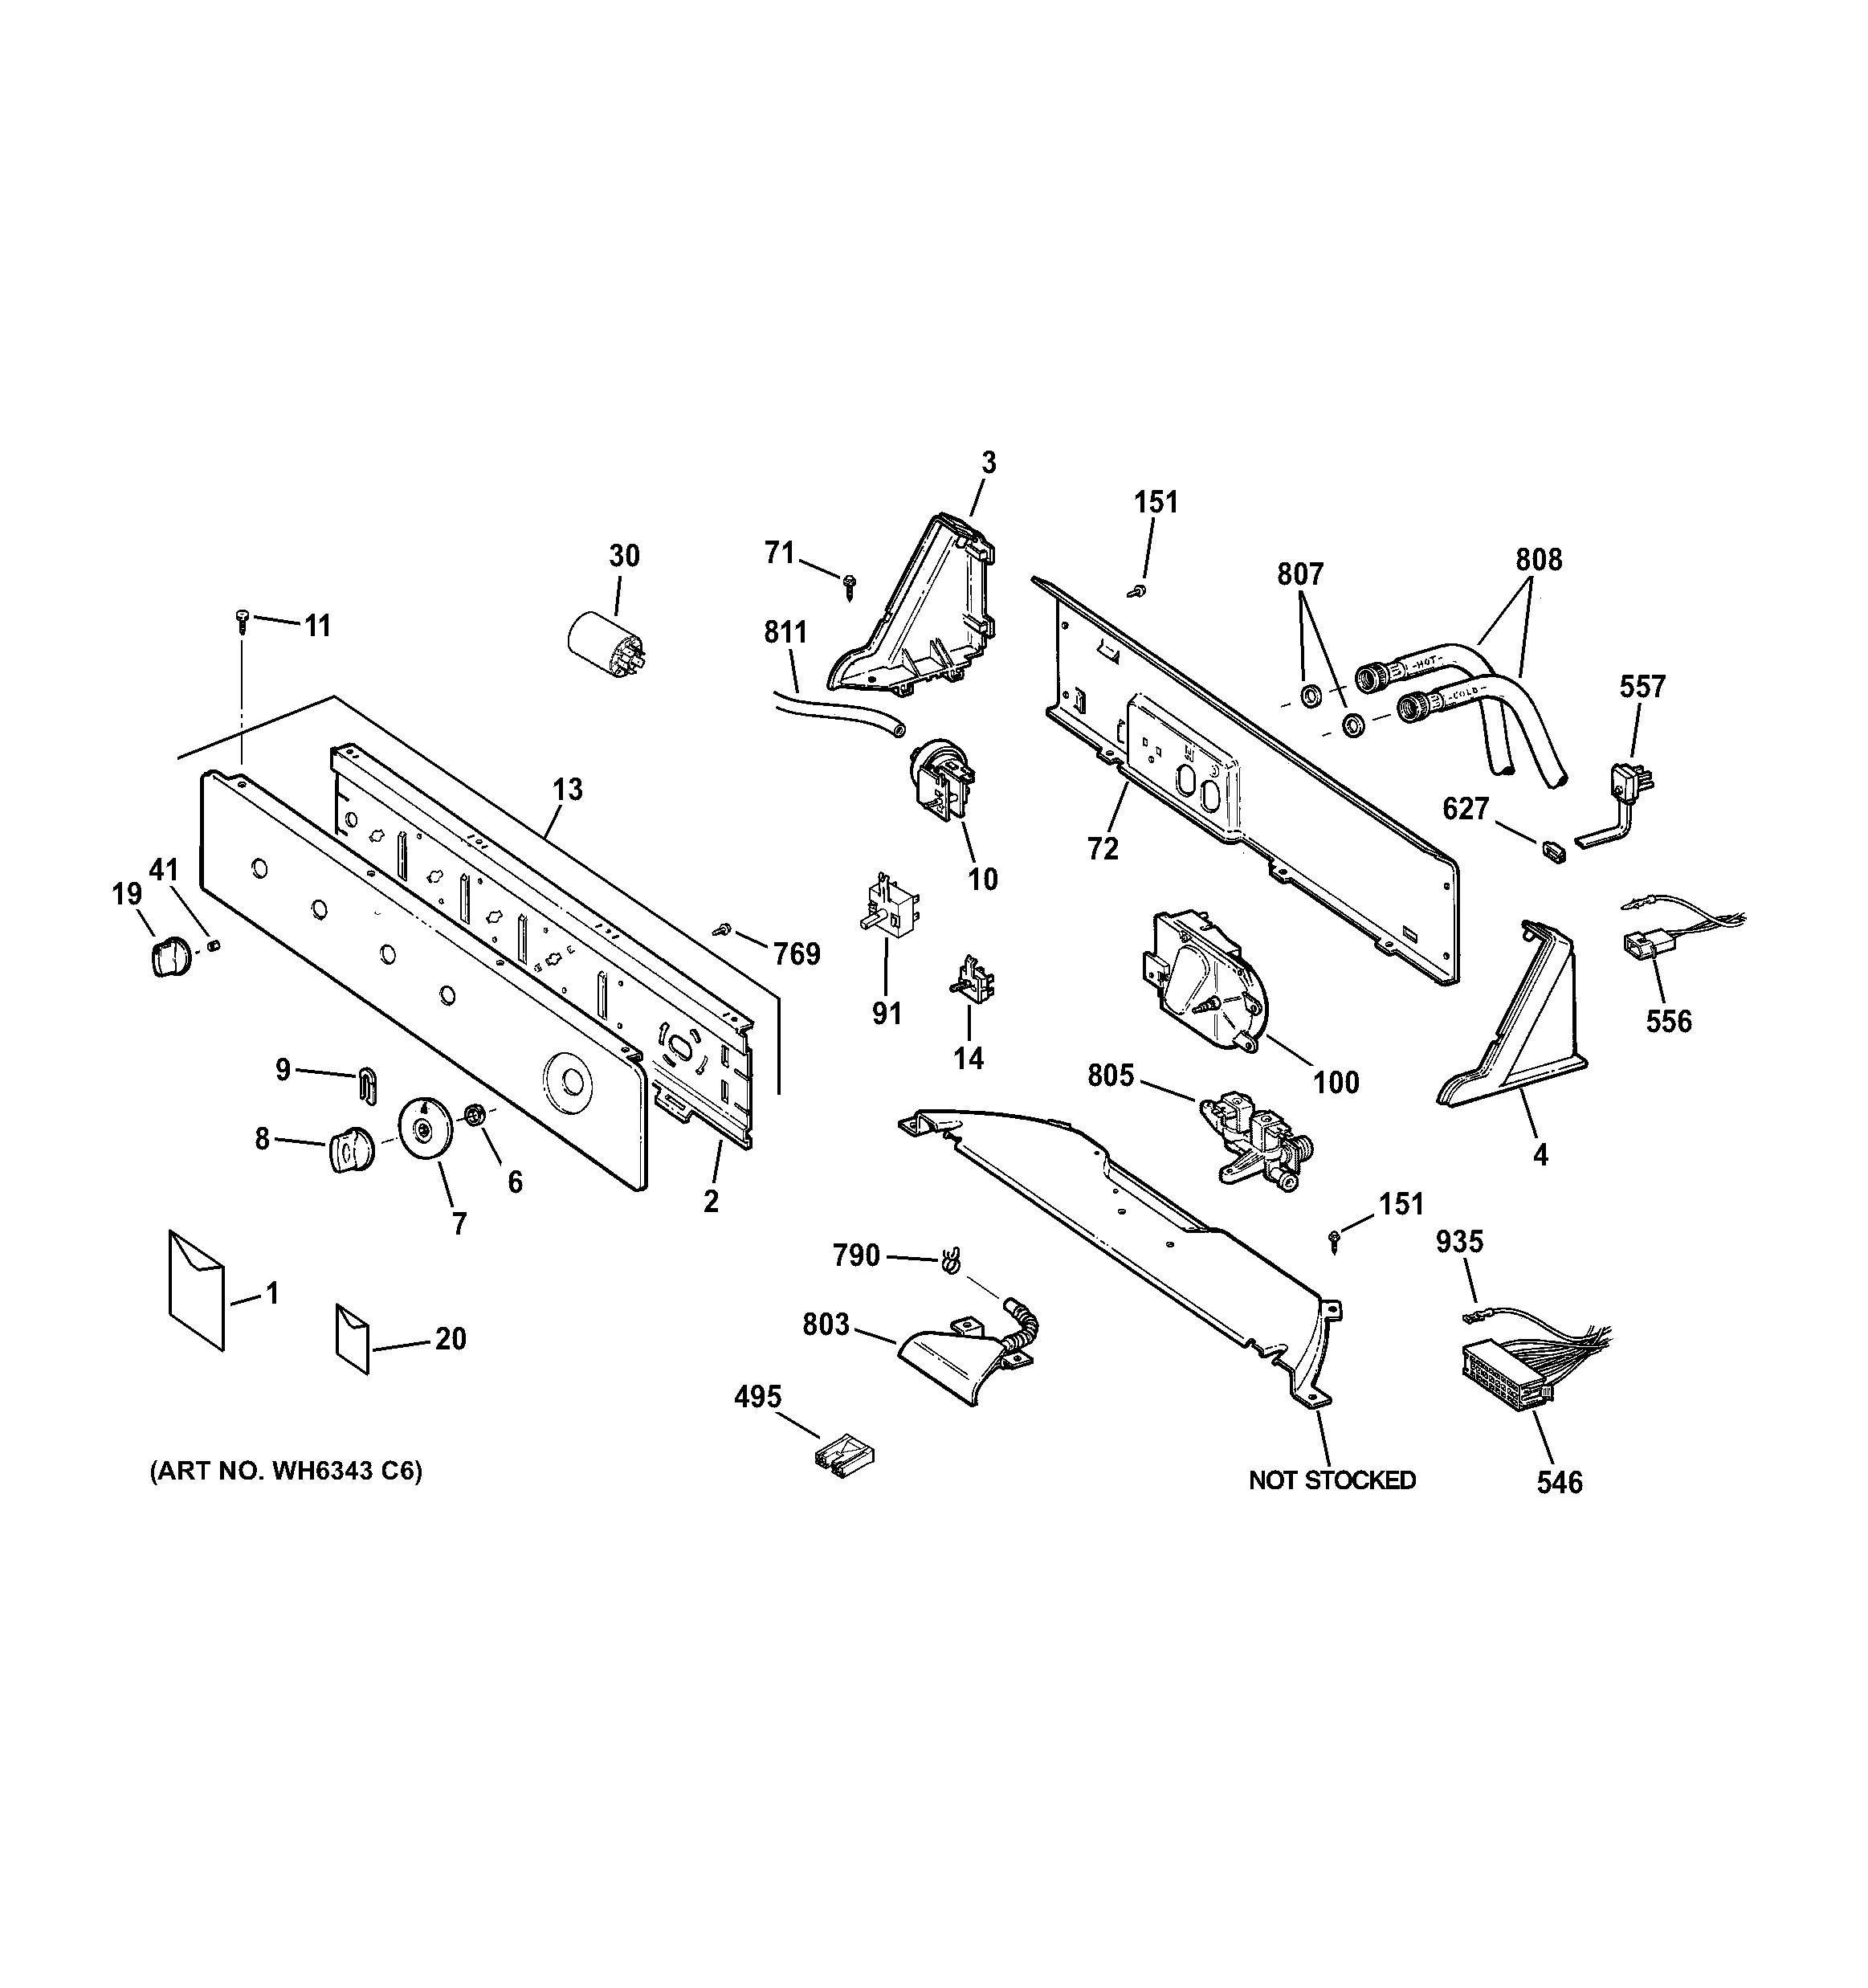 Craftsman Leaf Blower Parts Diagram Ge Washer Parts Model Wjsr4160dccc Of Craftsman Leaf Blower Parts Diagram